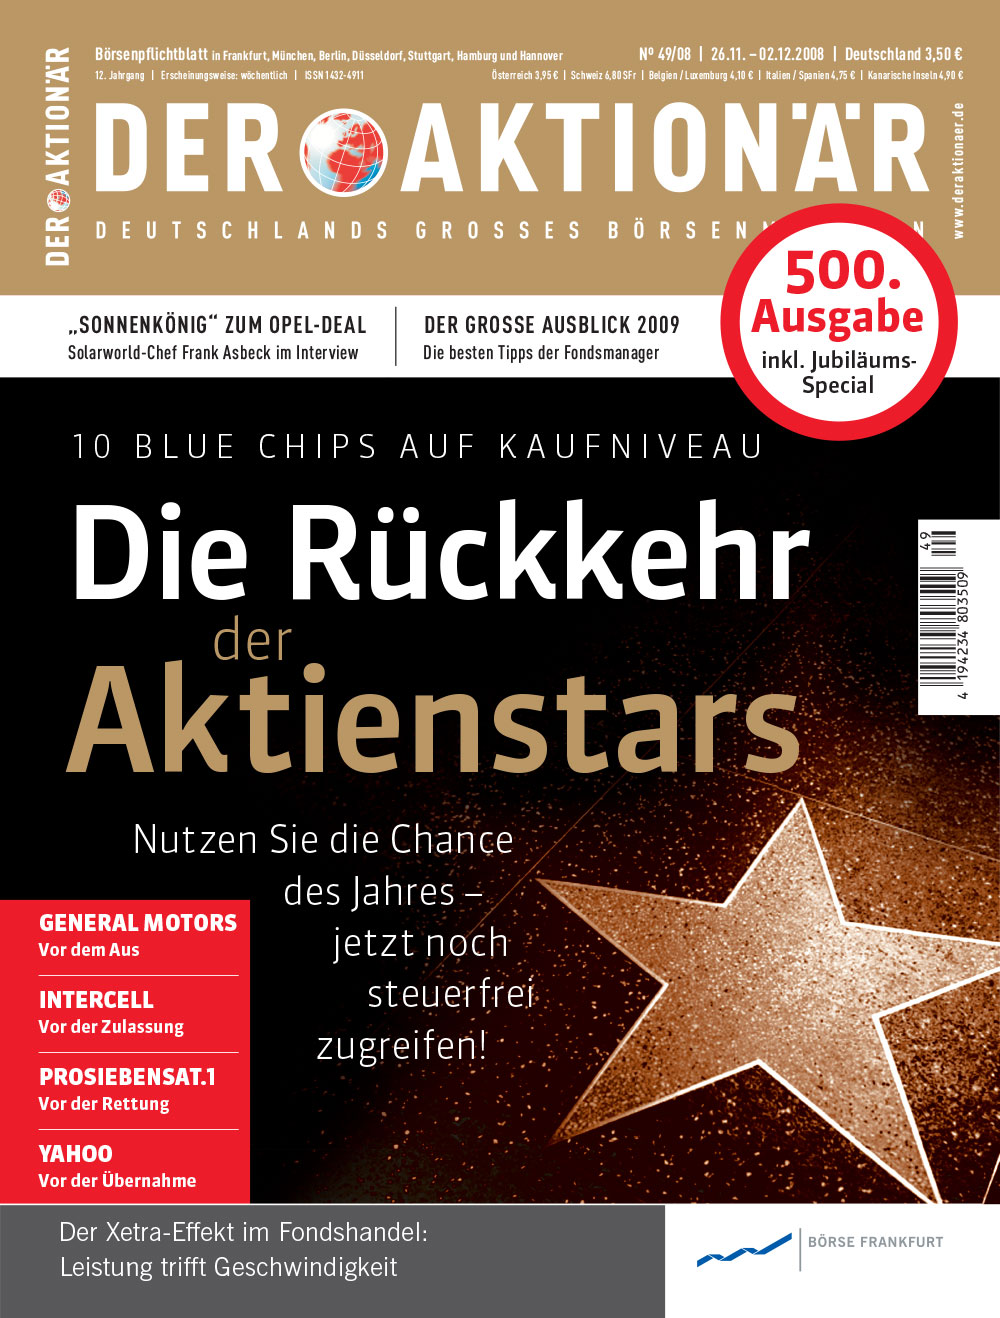 DER AKTIONÄR November/Dezember 2008: Die Rückkehr der Aktienstars